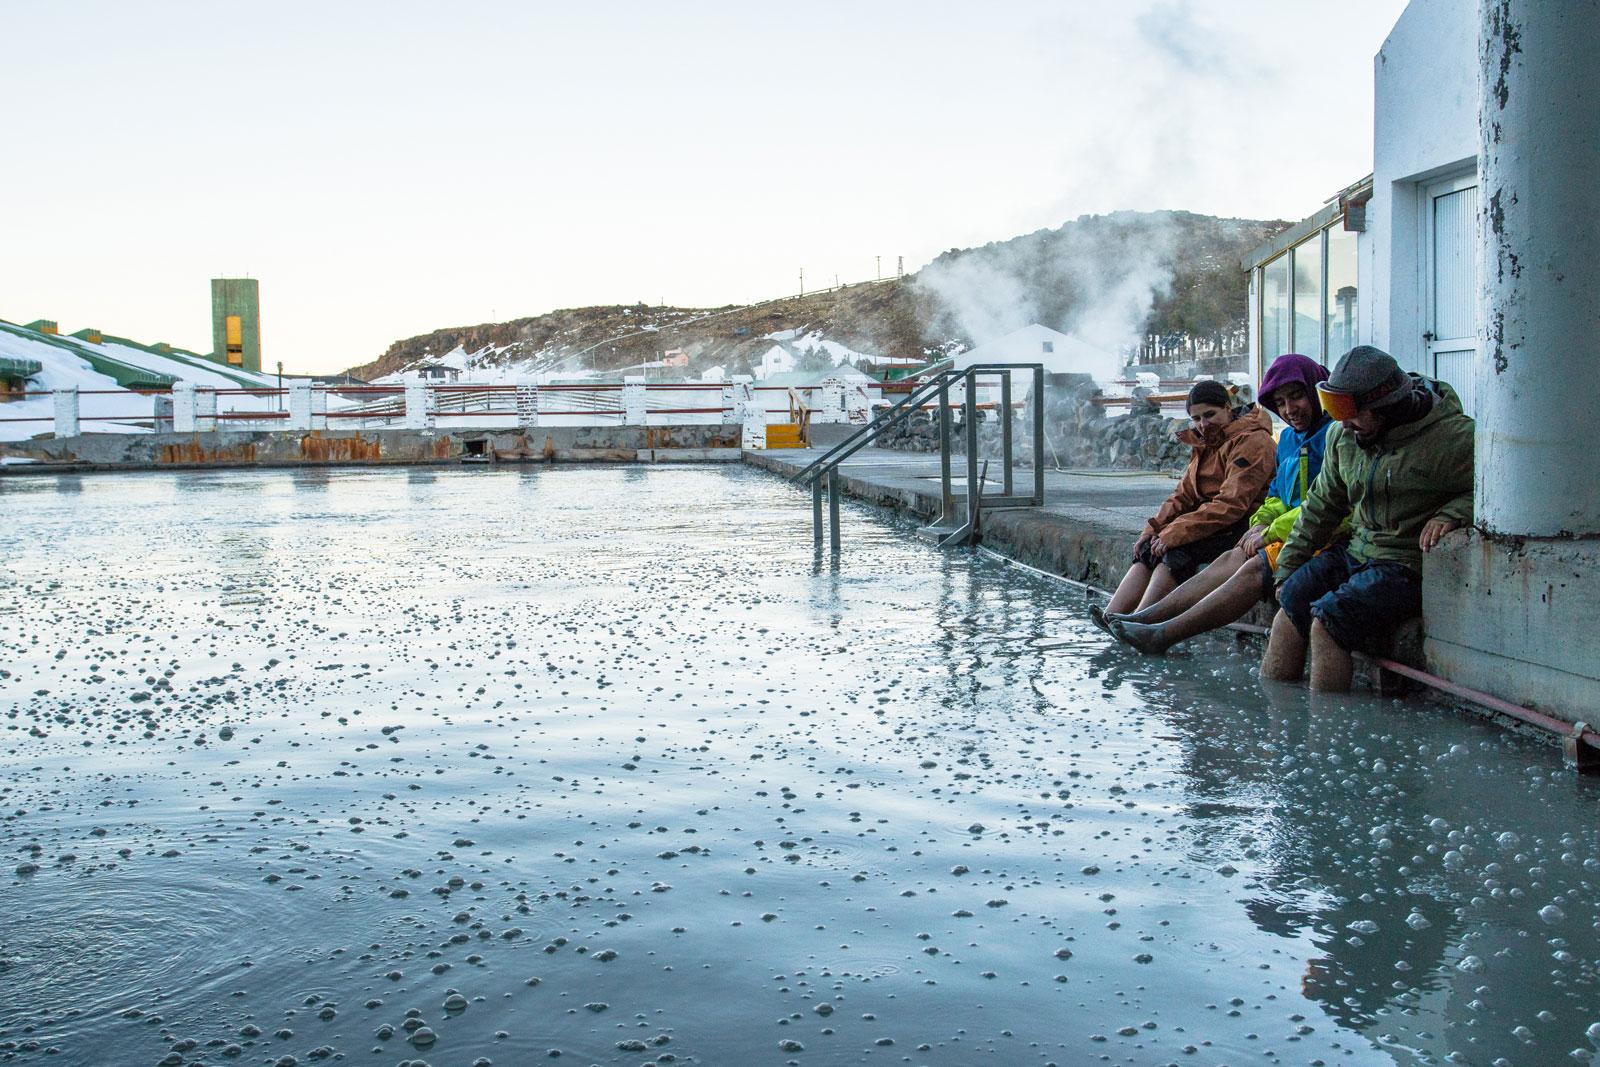 Mud bath hot spring. Photo Courtesy: Ben Girardi - Adventure in Argentina